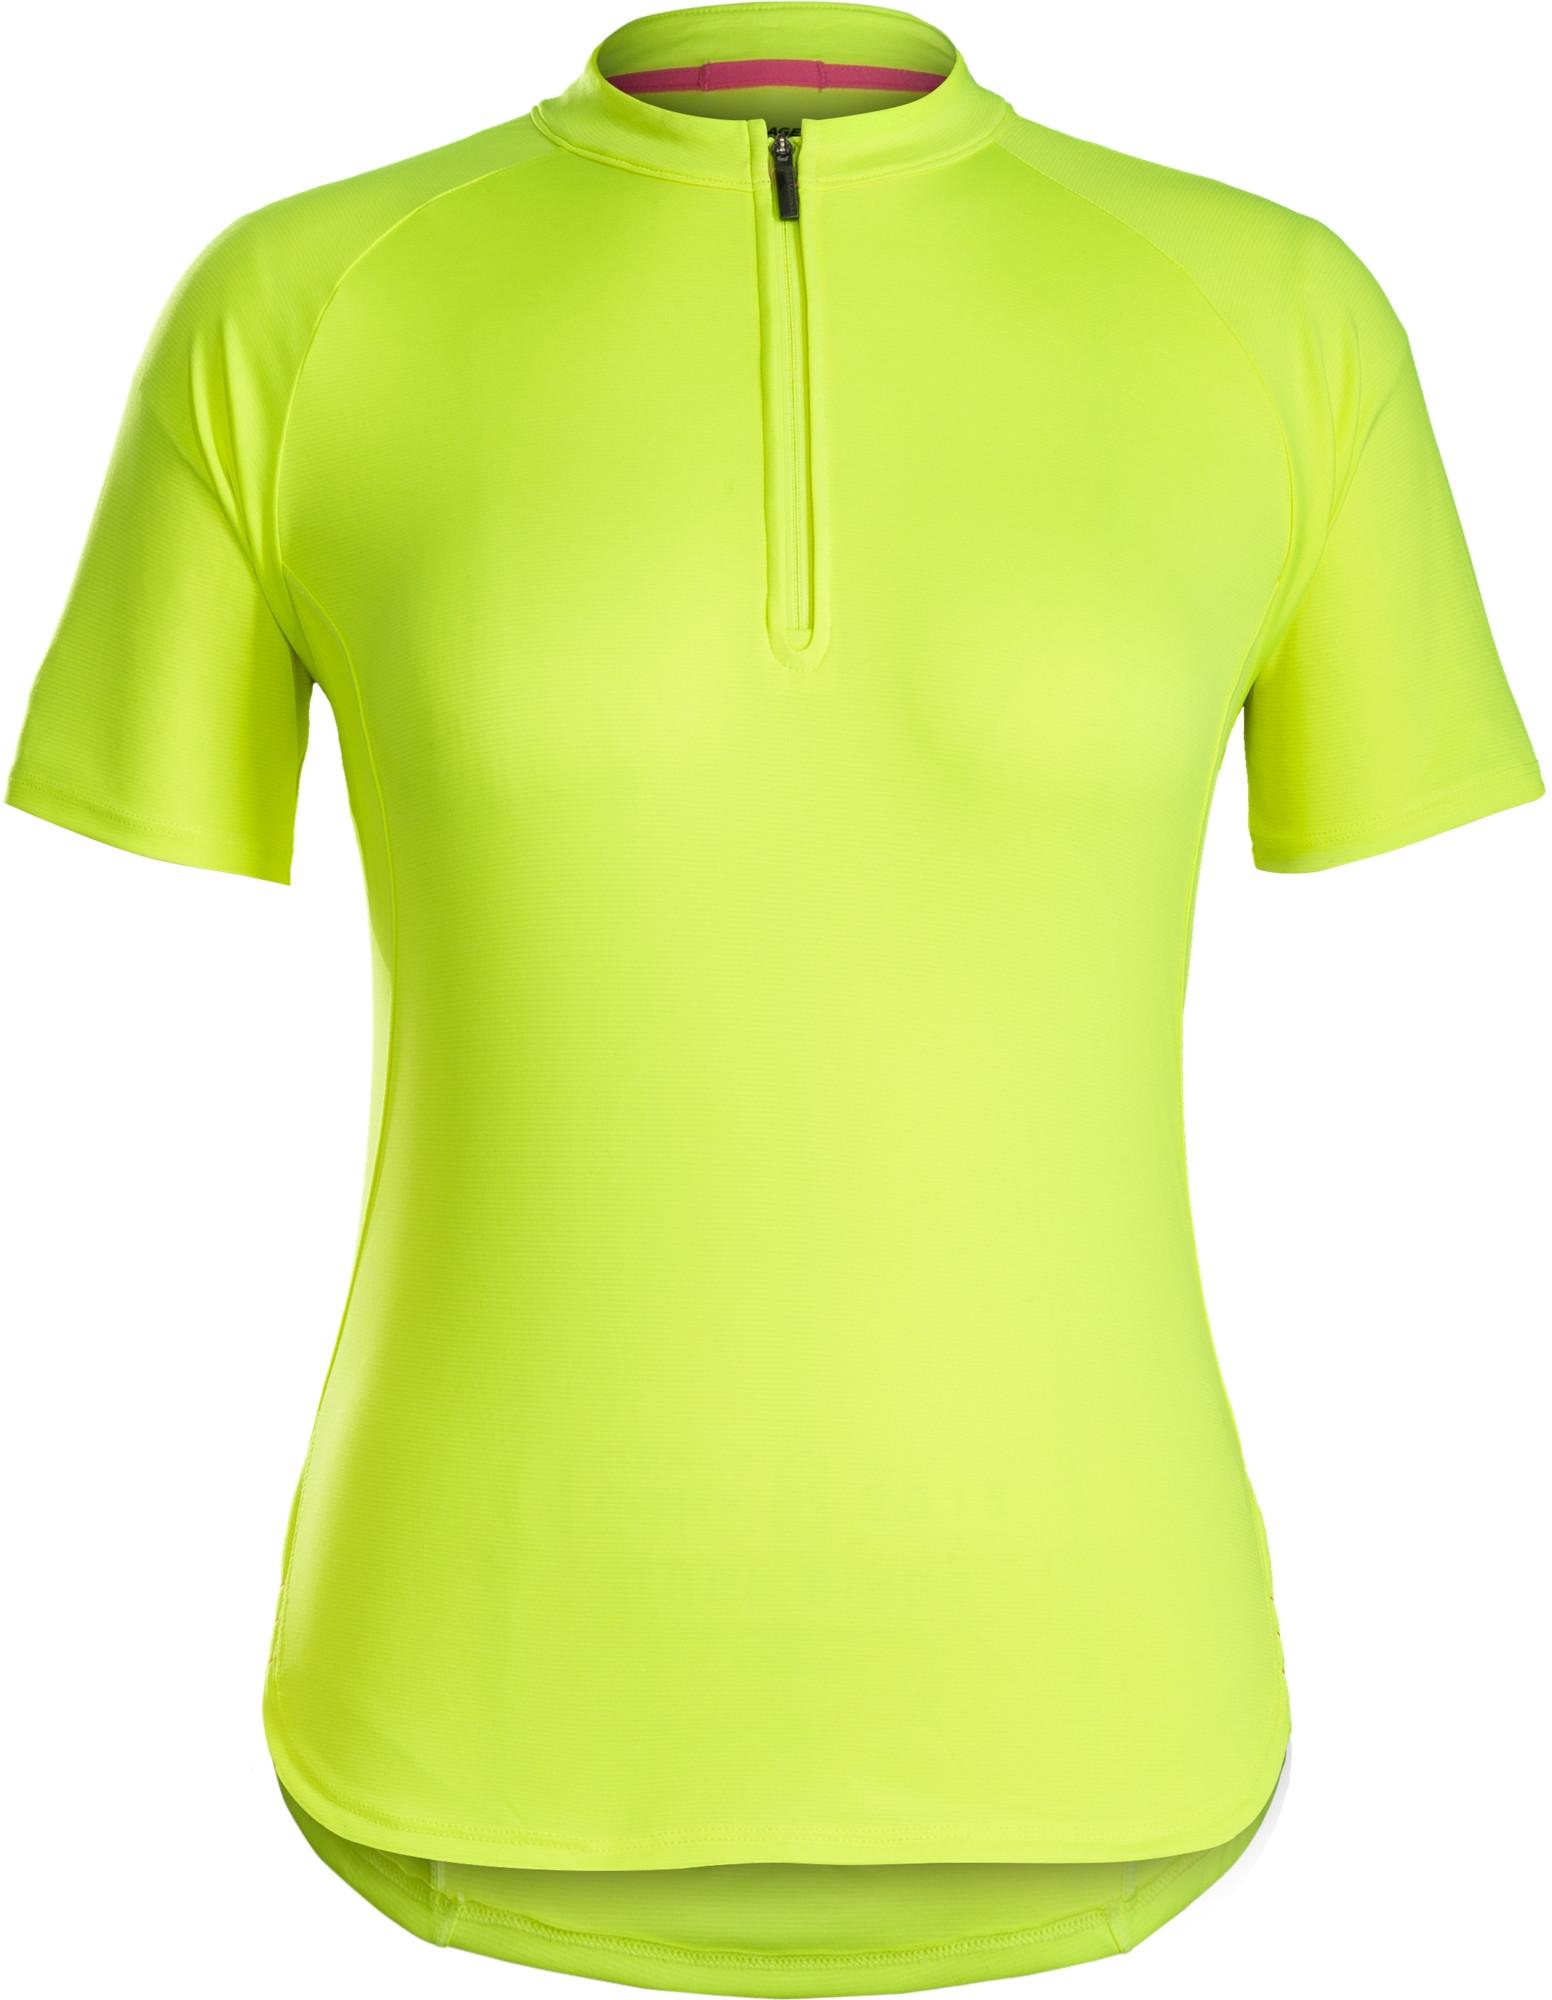 391218acd Bontrager Kalia Women s Fitness Jersey - Shop